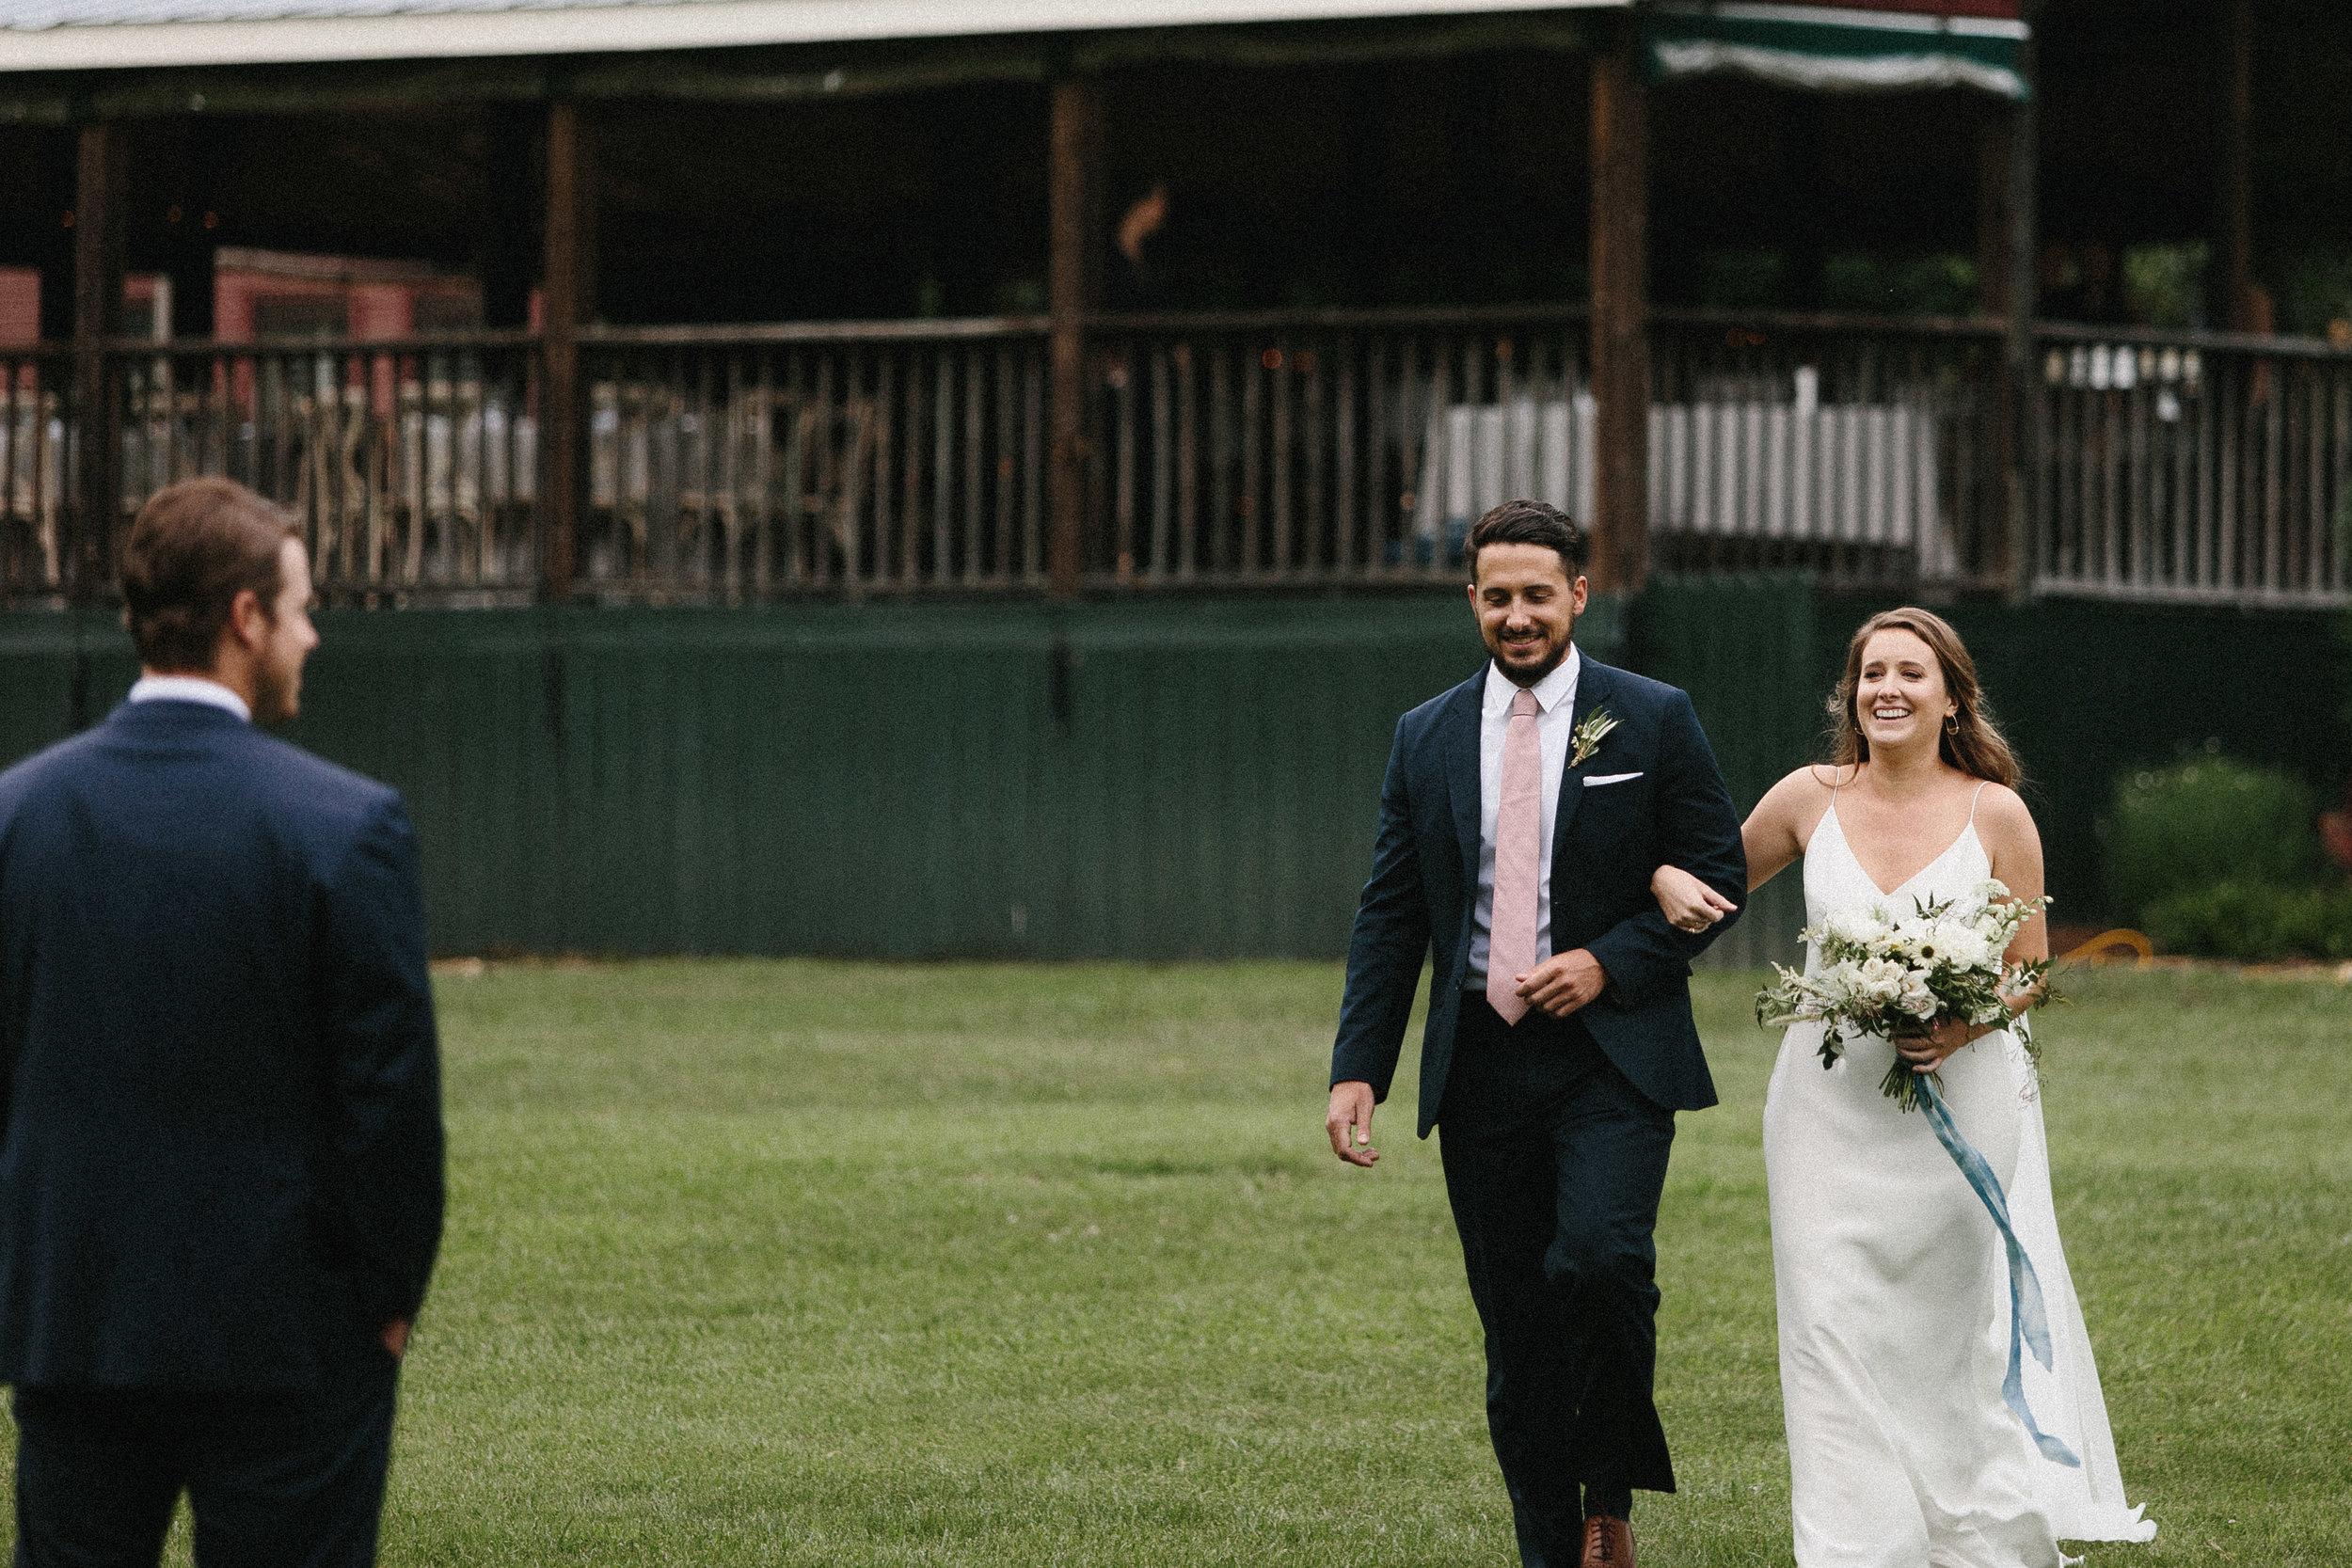 glen_ella_meadow_creekside_atlanta_wedding_photographers_1666.jpg